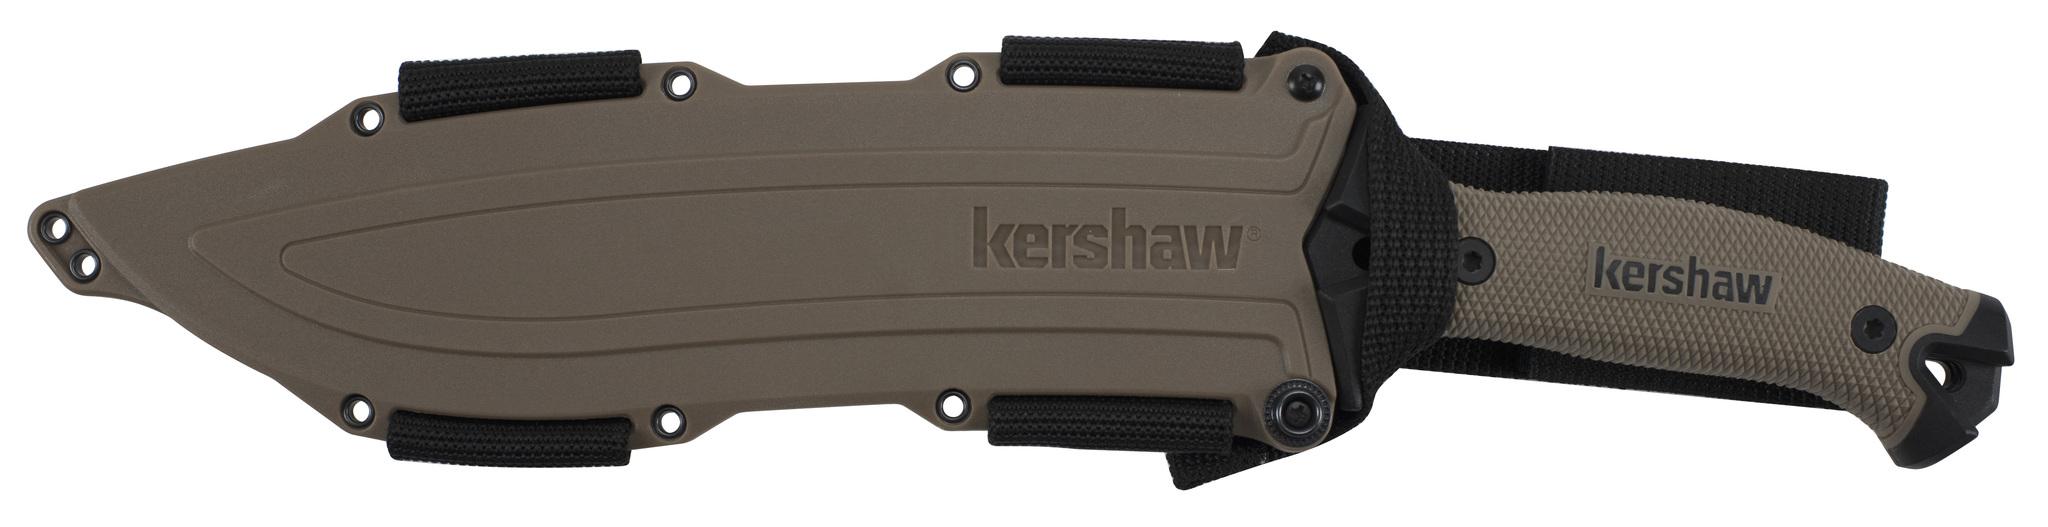 Фото 4 - Кукри мачете Camp 10 TAN - Kershaw 1077TAN, сталь 65MN Carbon, рукоять прорезиненный термопластик, коричневый